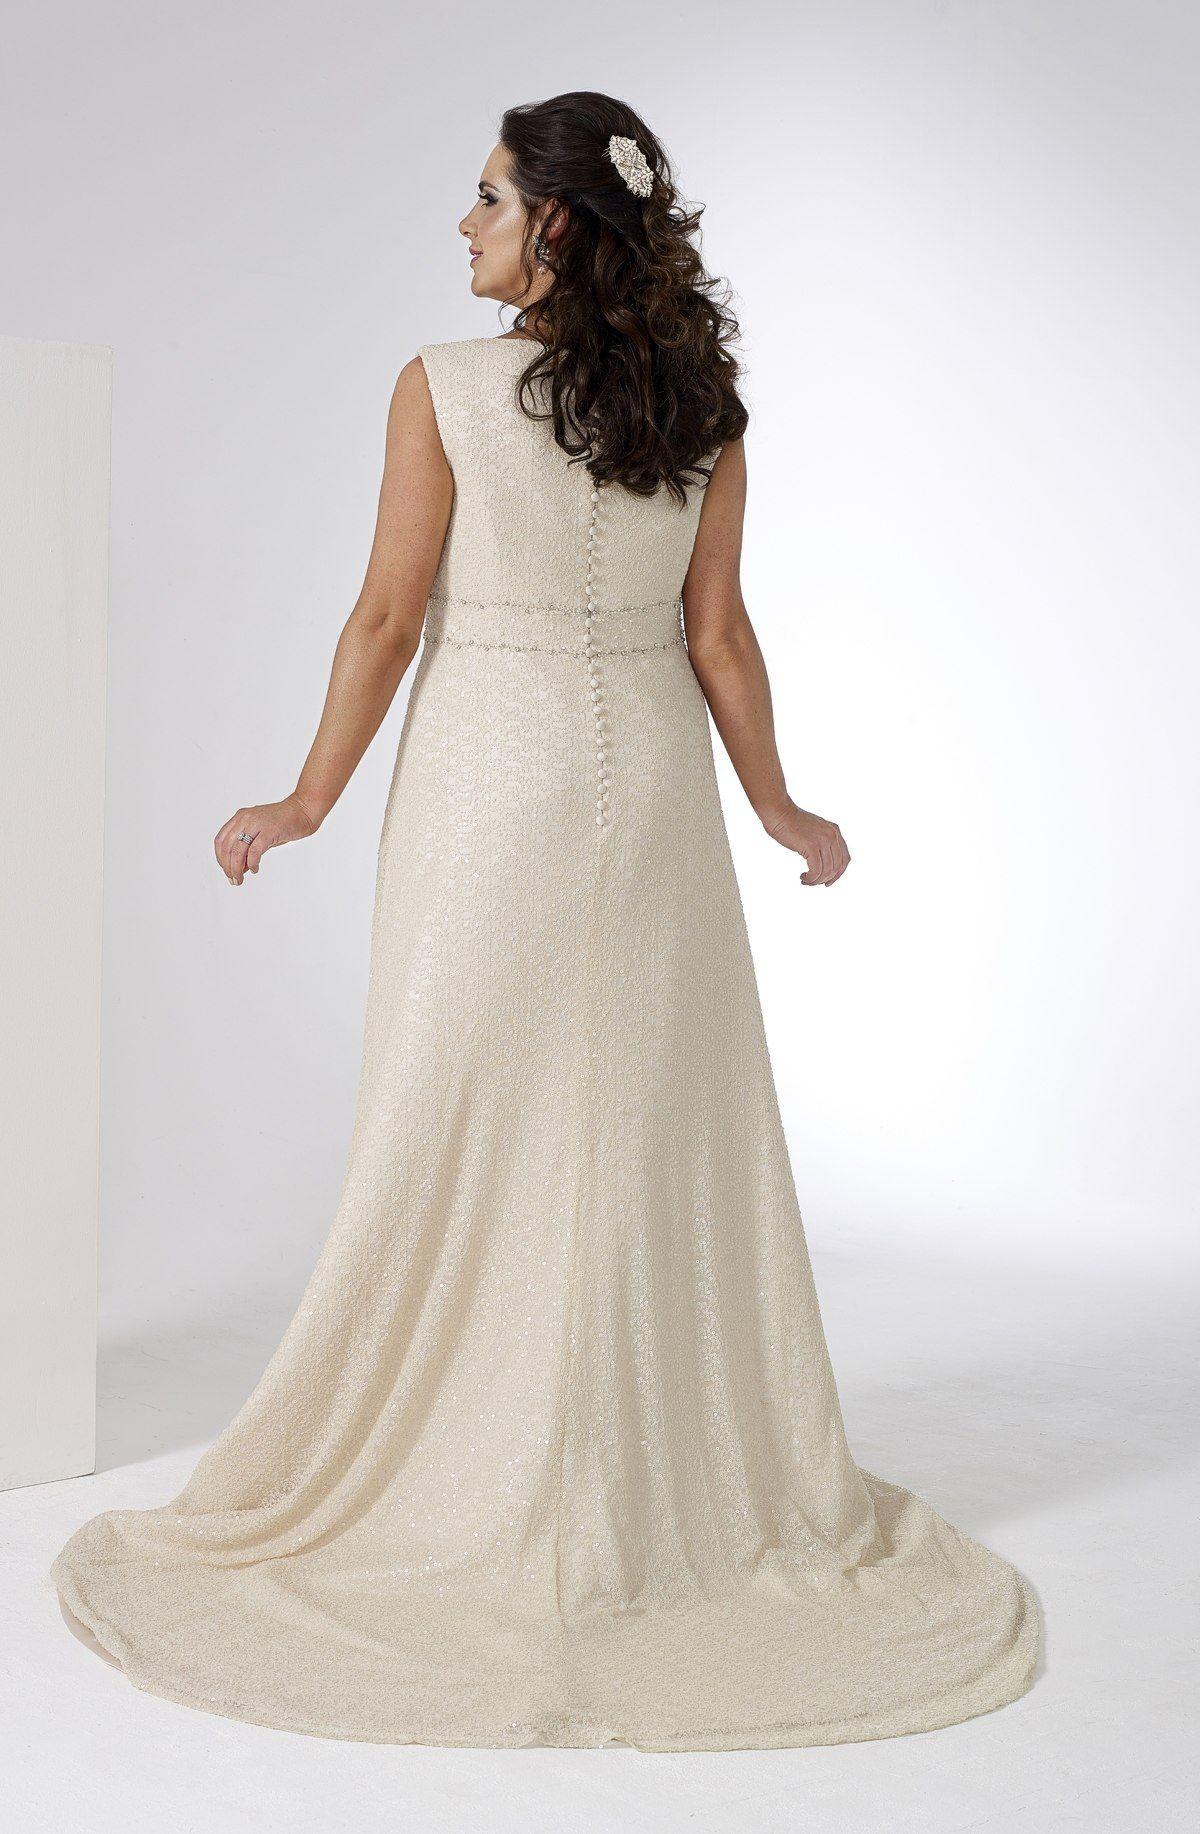 Son91905 Sonsie Collection Veromia Sheath Wedding Dress Wedding Dresses Lace Wedding Dresses [ 1834 x 1200 Pixel ]